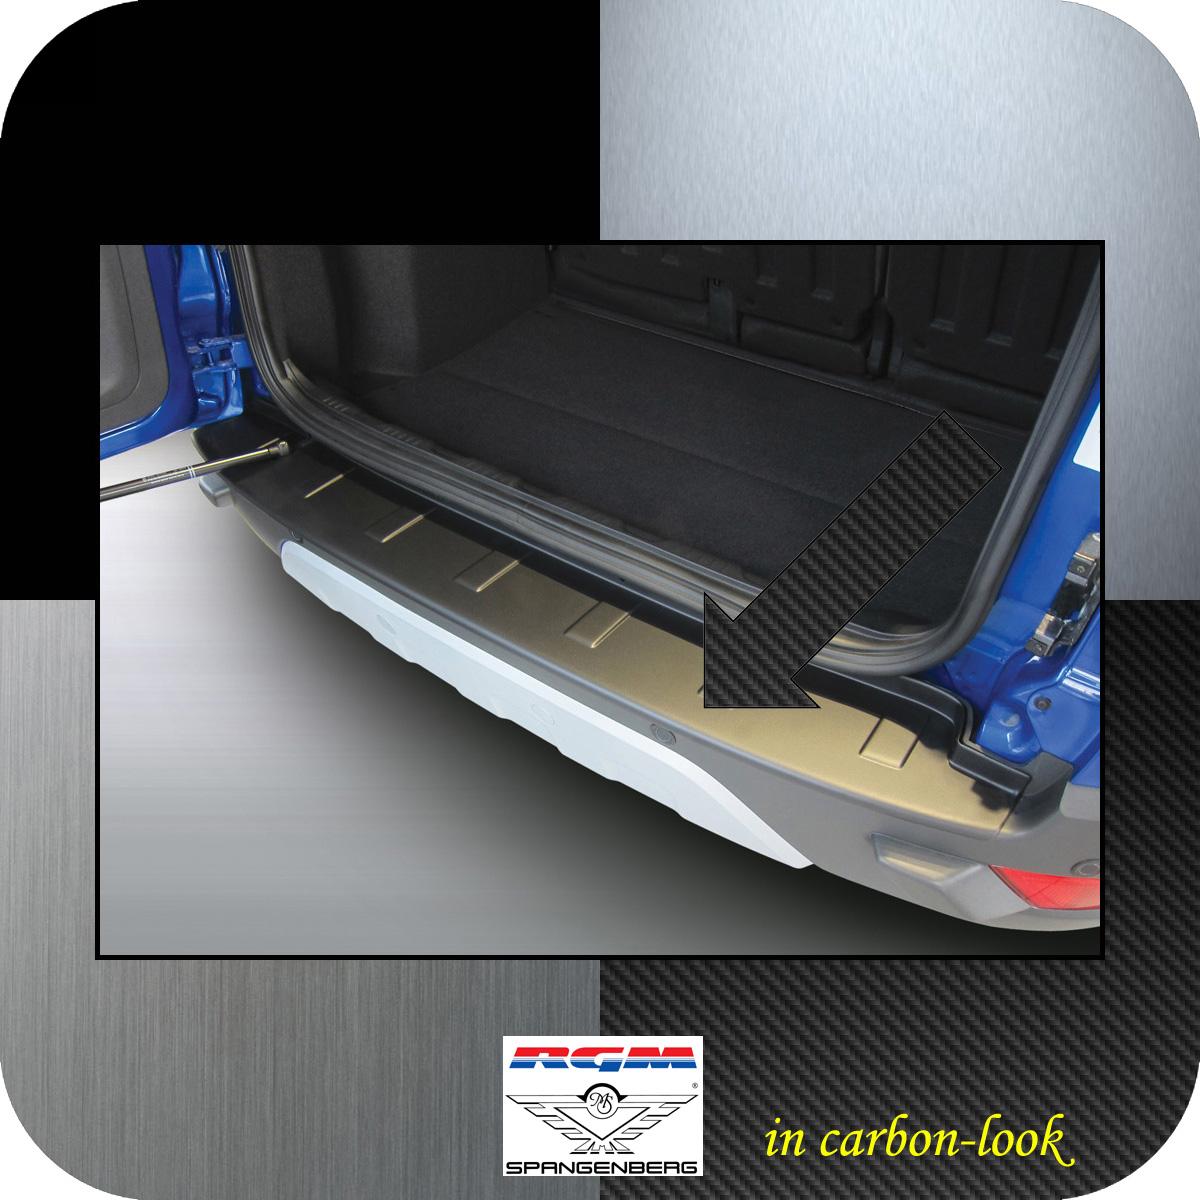 Ladekantenschutz Carbon-Look Ford EcoSport SUV Kombi vor Mopf 2012-17 3509814